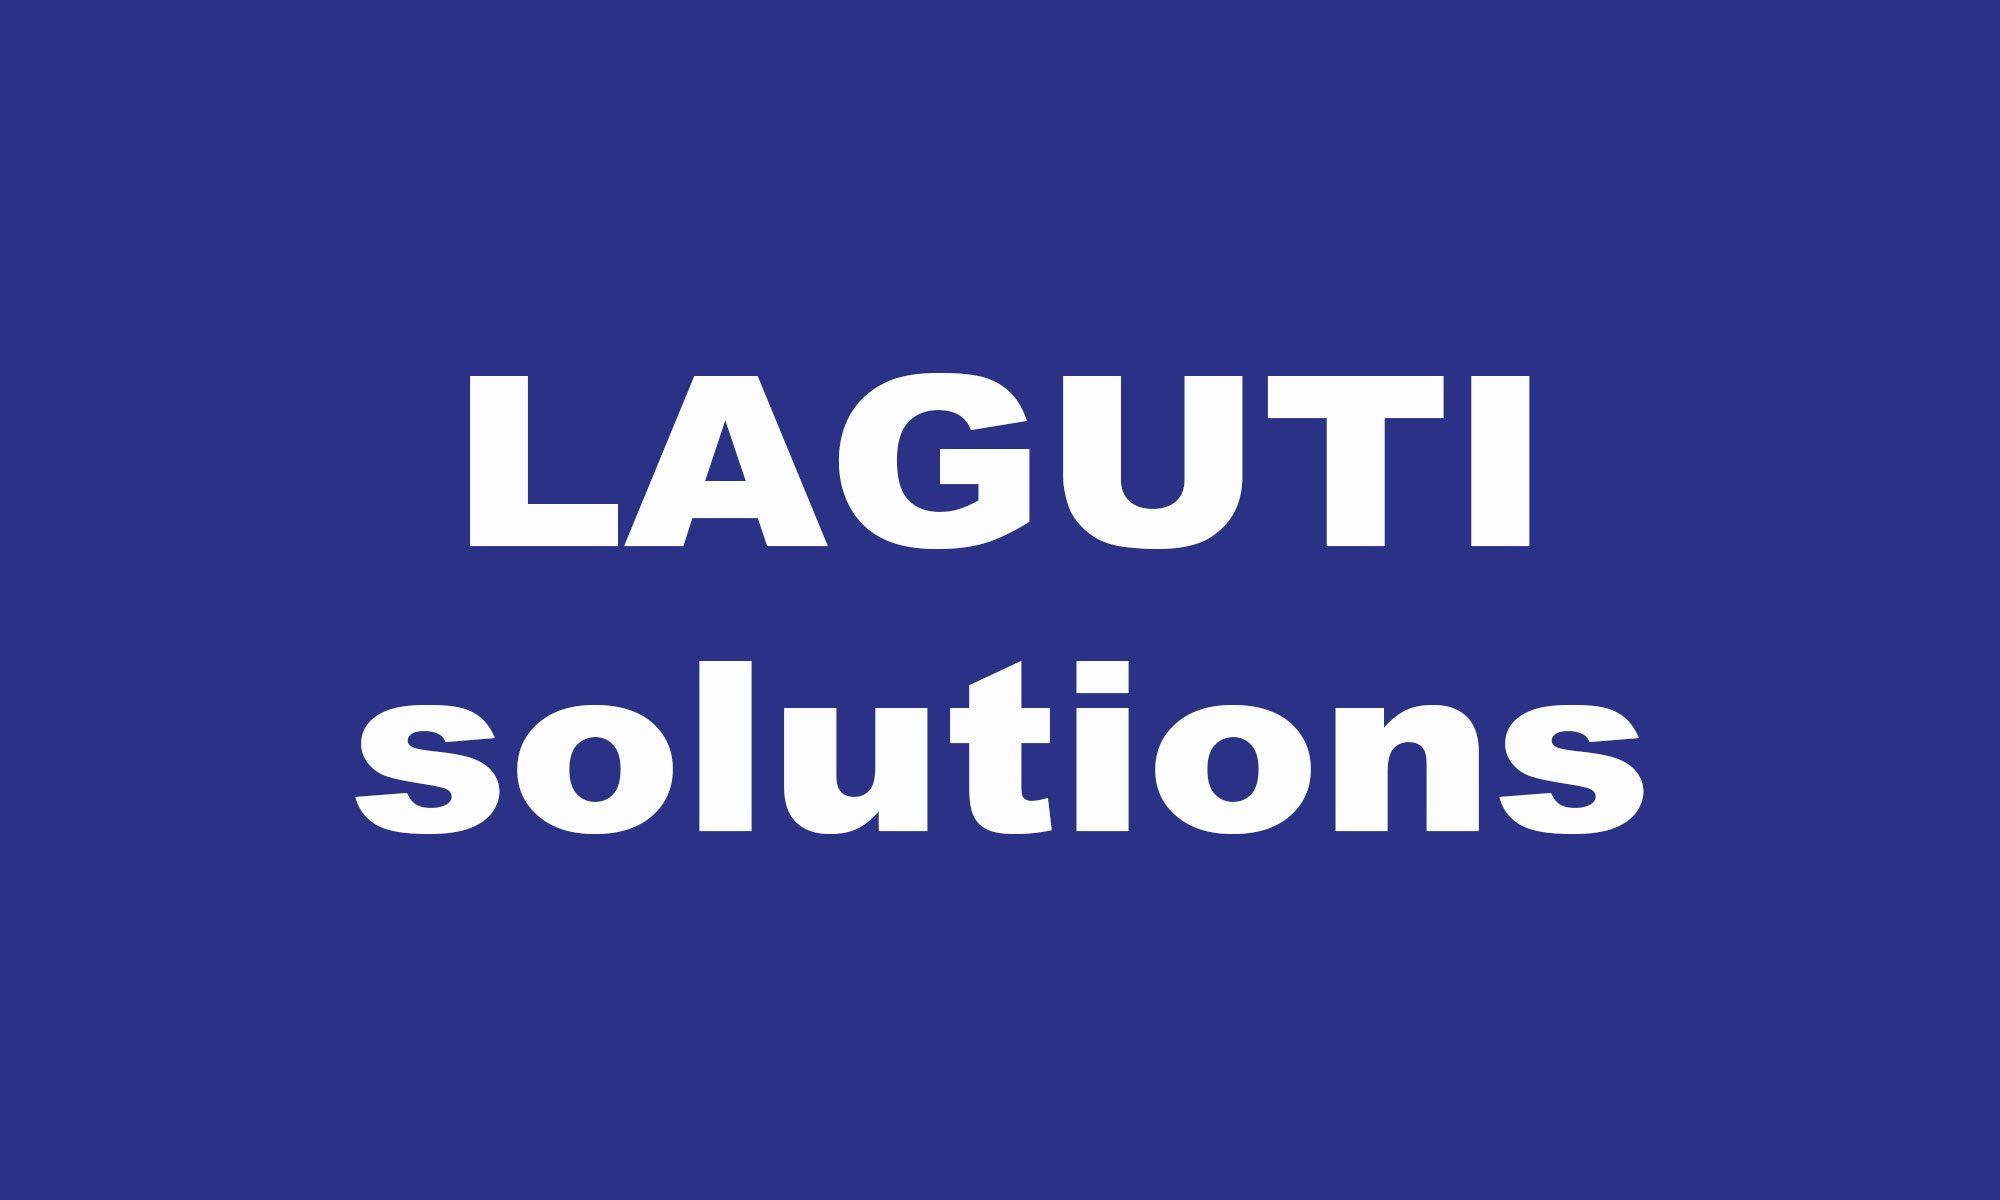 LaGuti Solutions